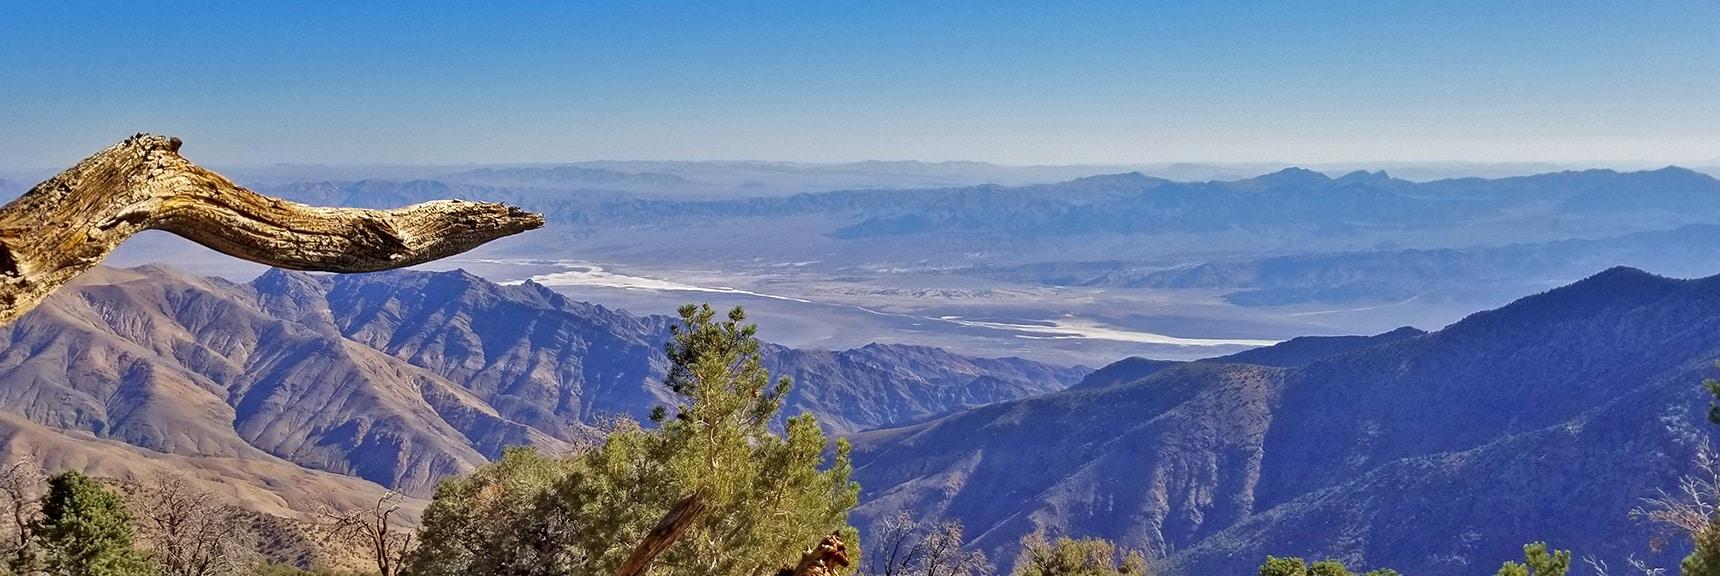 Death Valley (Furnace Creek Area Center) from Wildrose Peak Summit Ascent   Wildrose Peak   Panamint Mountain Range   Death Valley National Park, California